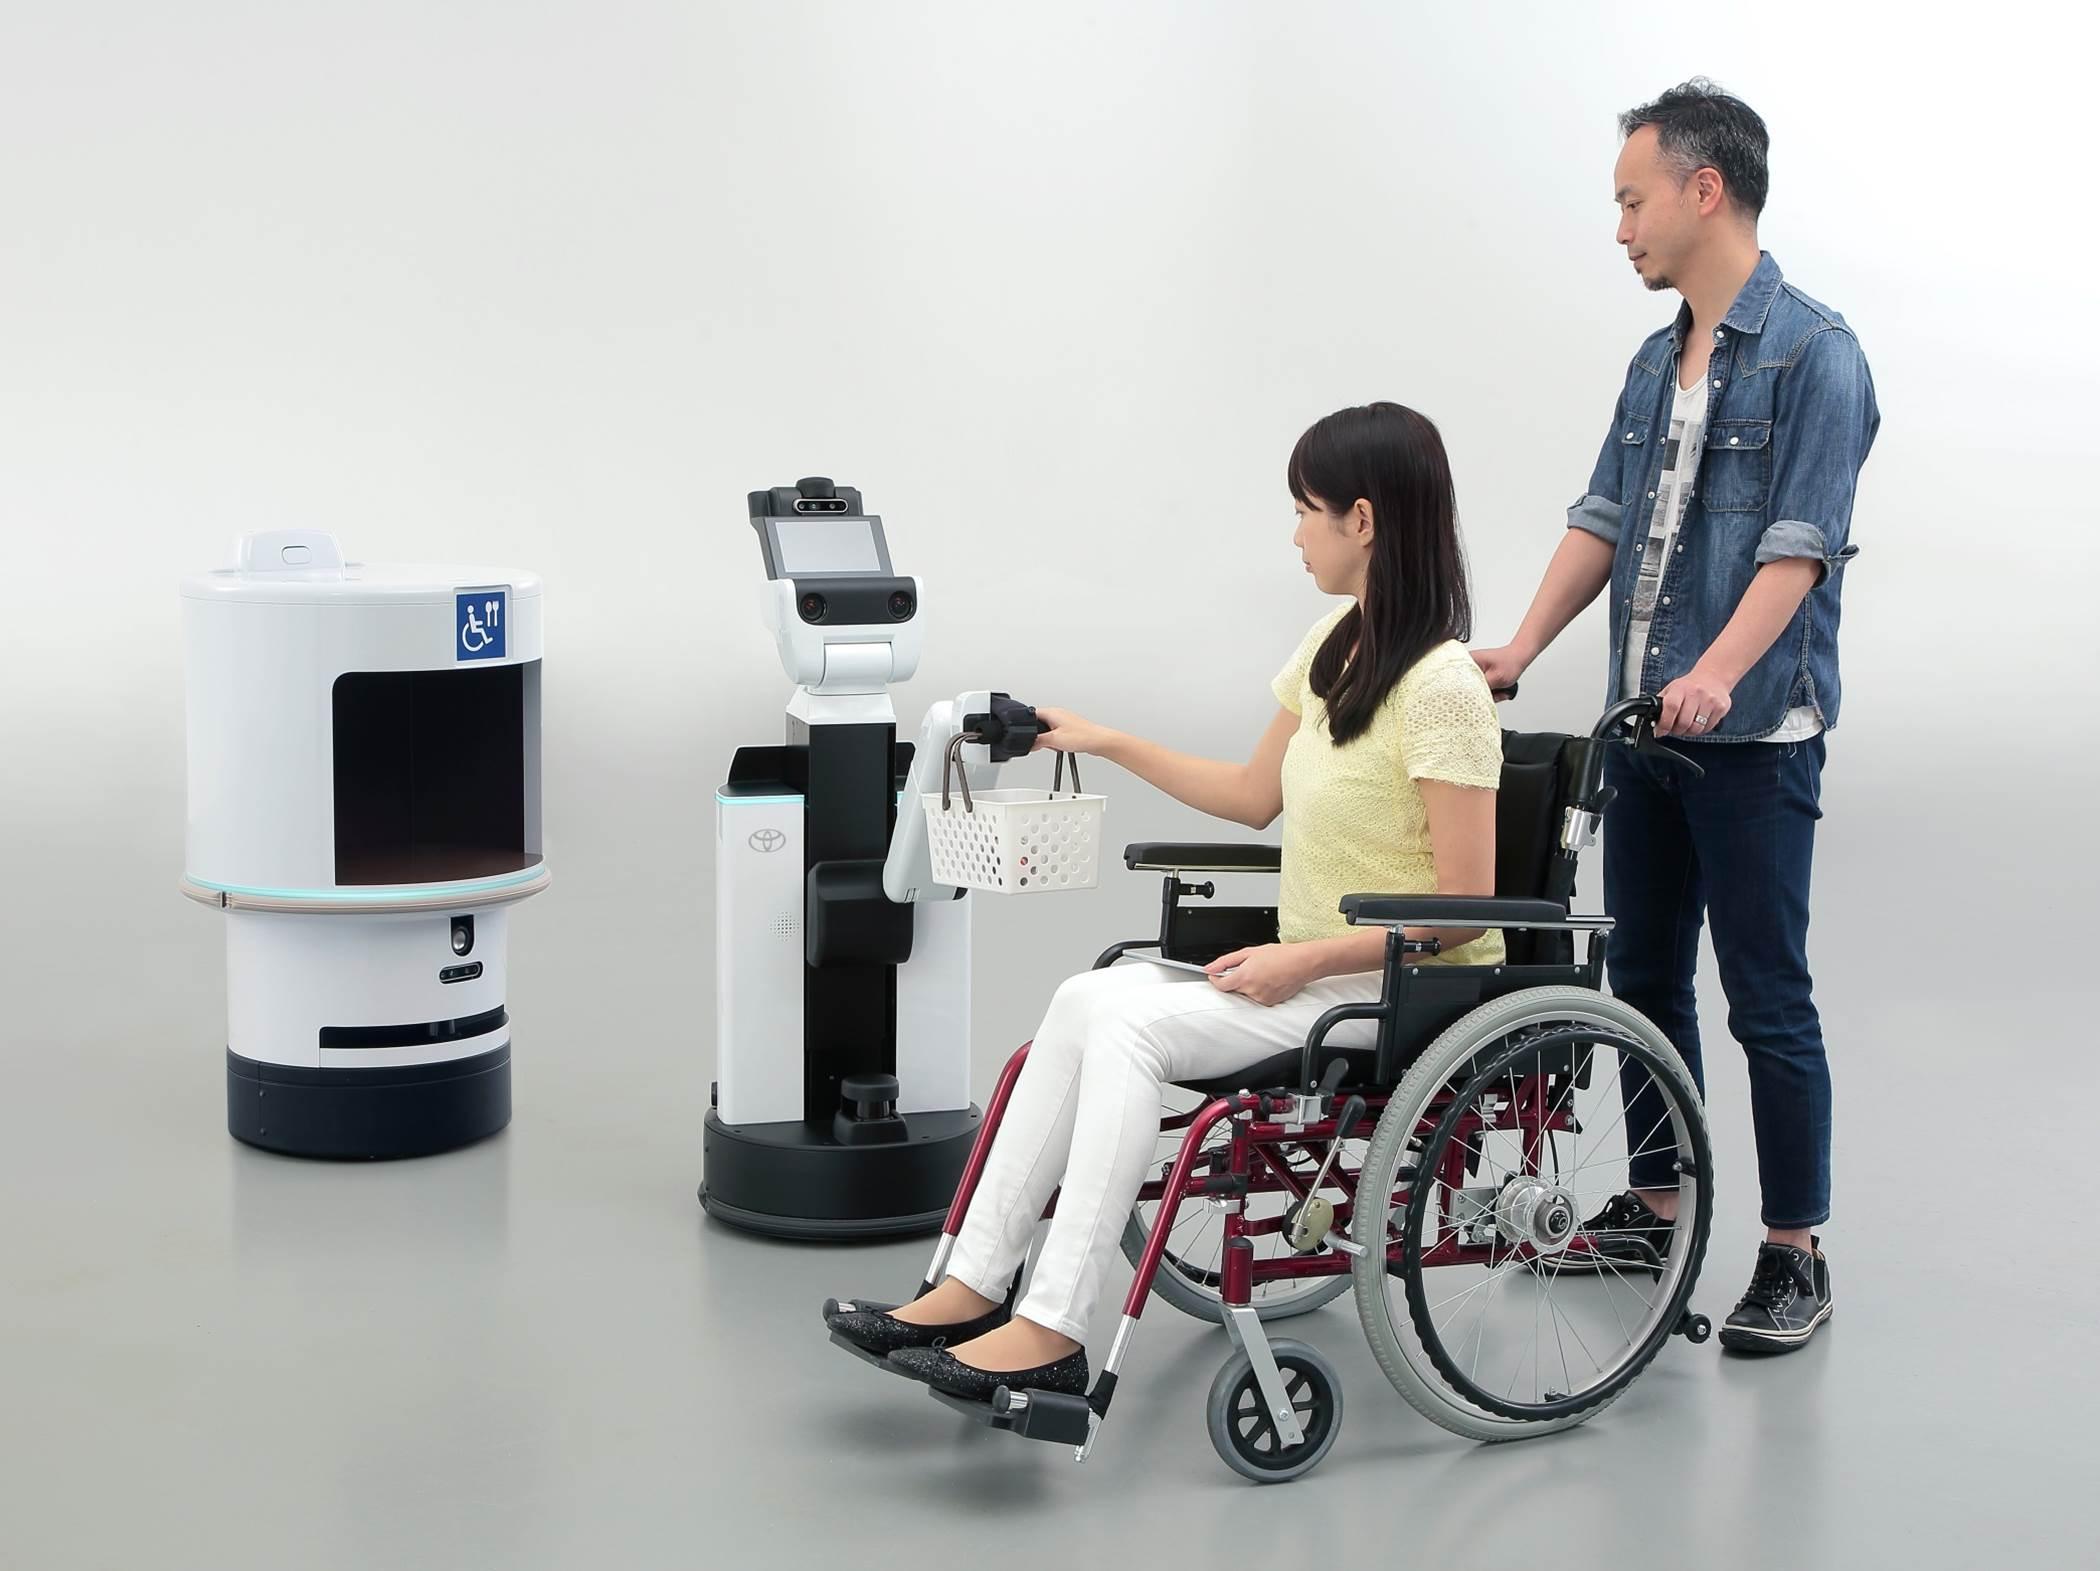 HSR Human Support Robot DSR Delivery Support Robot